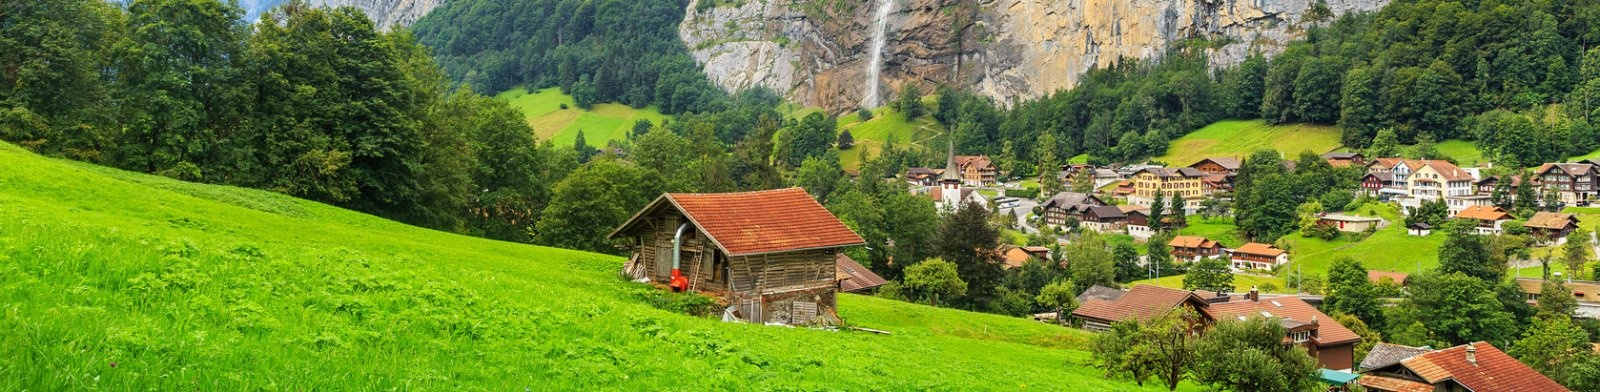 Bernese Oberland, main image